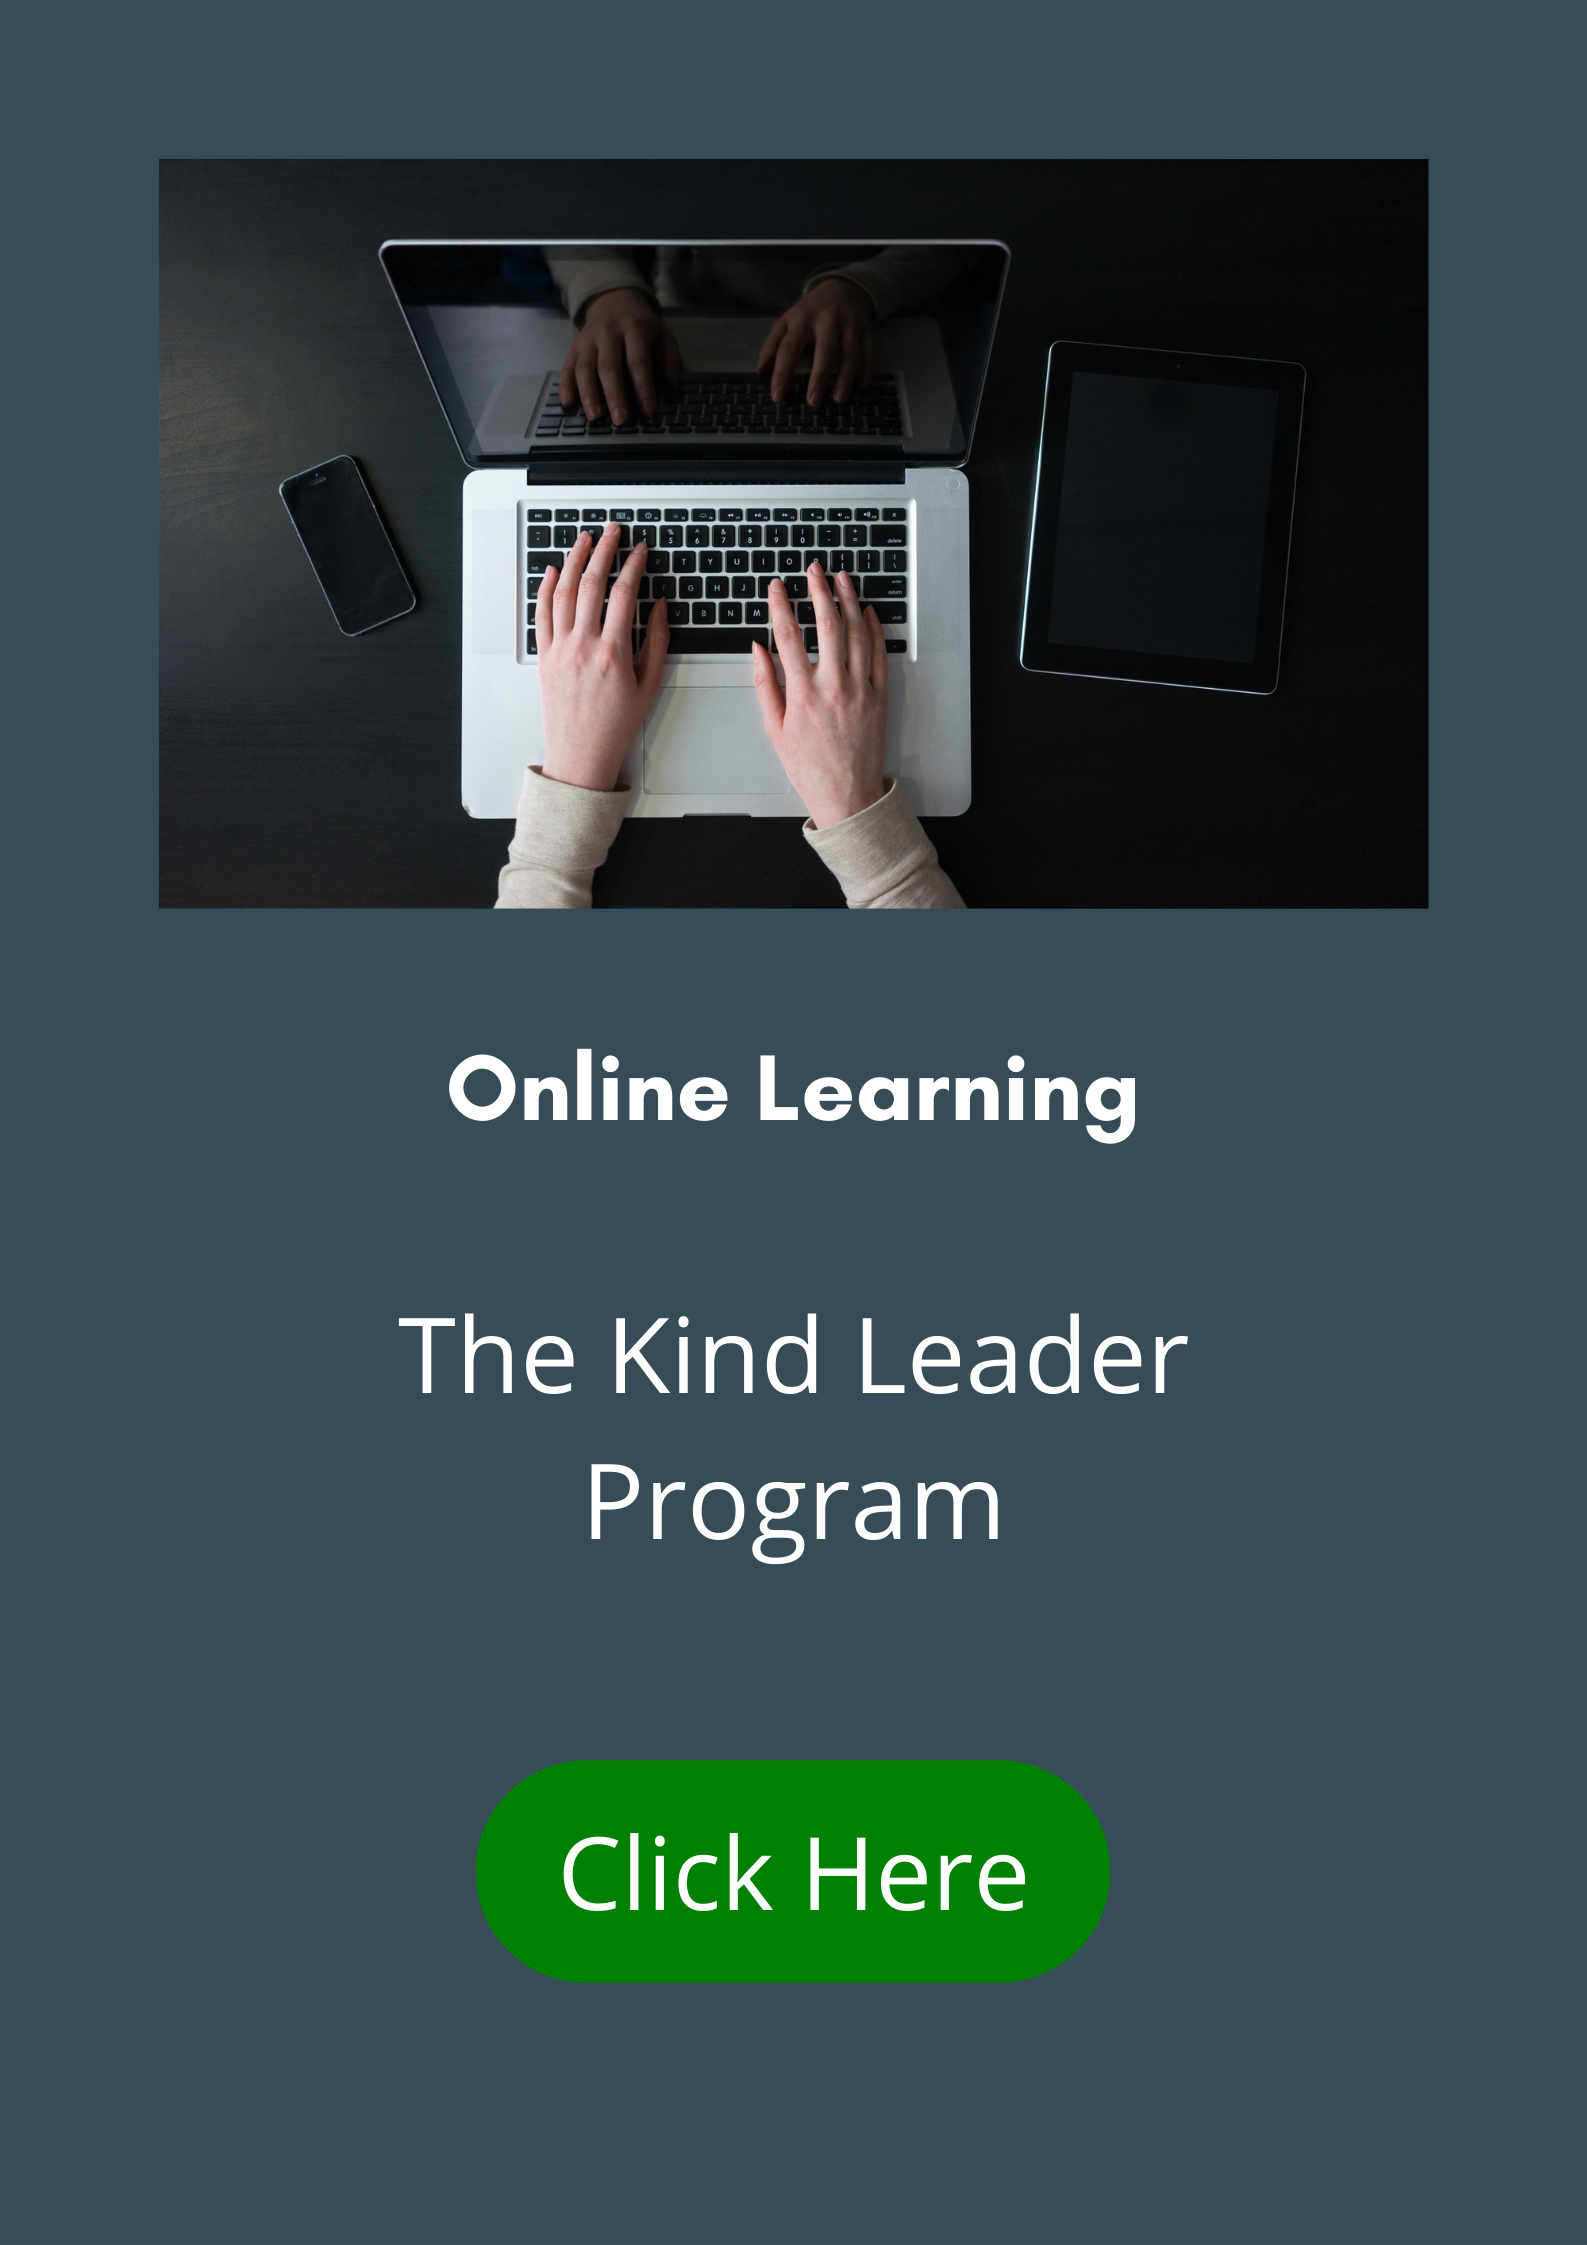 The Kind Leader Online Course